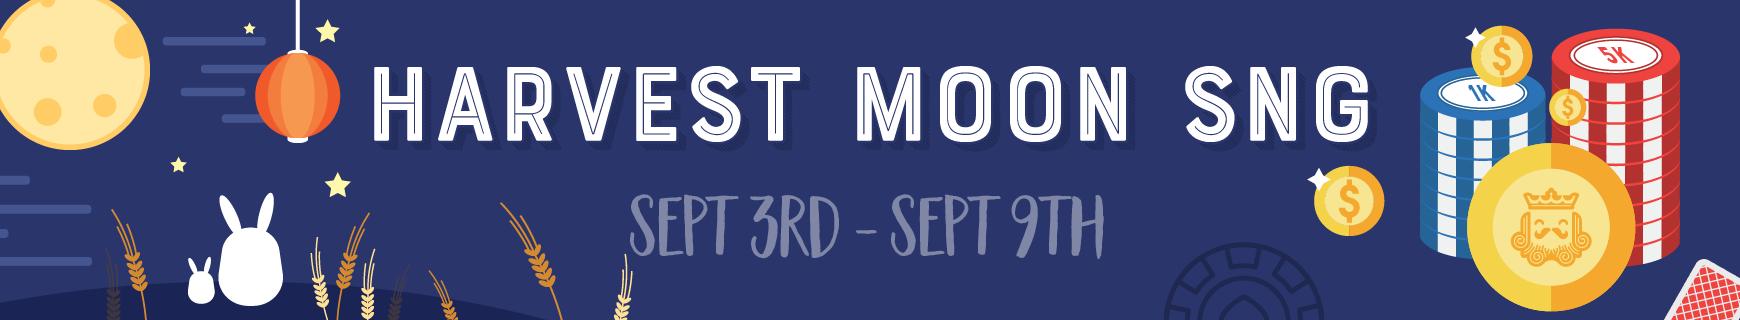 Harvest moon sng %28870 x 160%29 2x